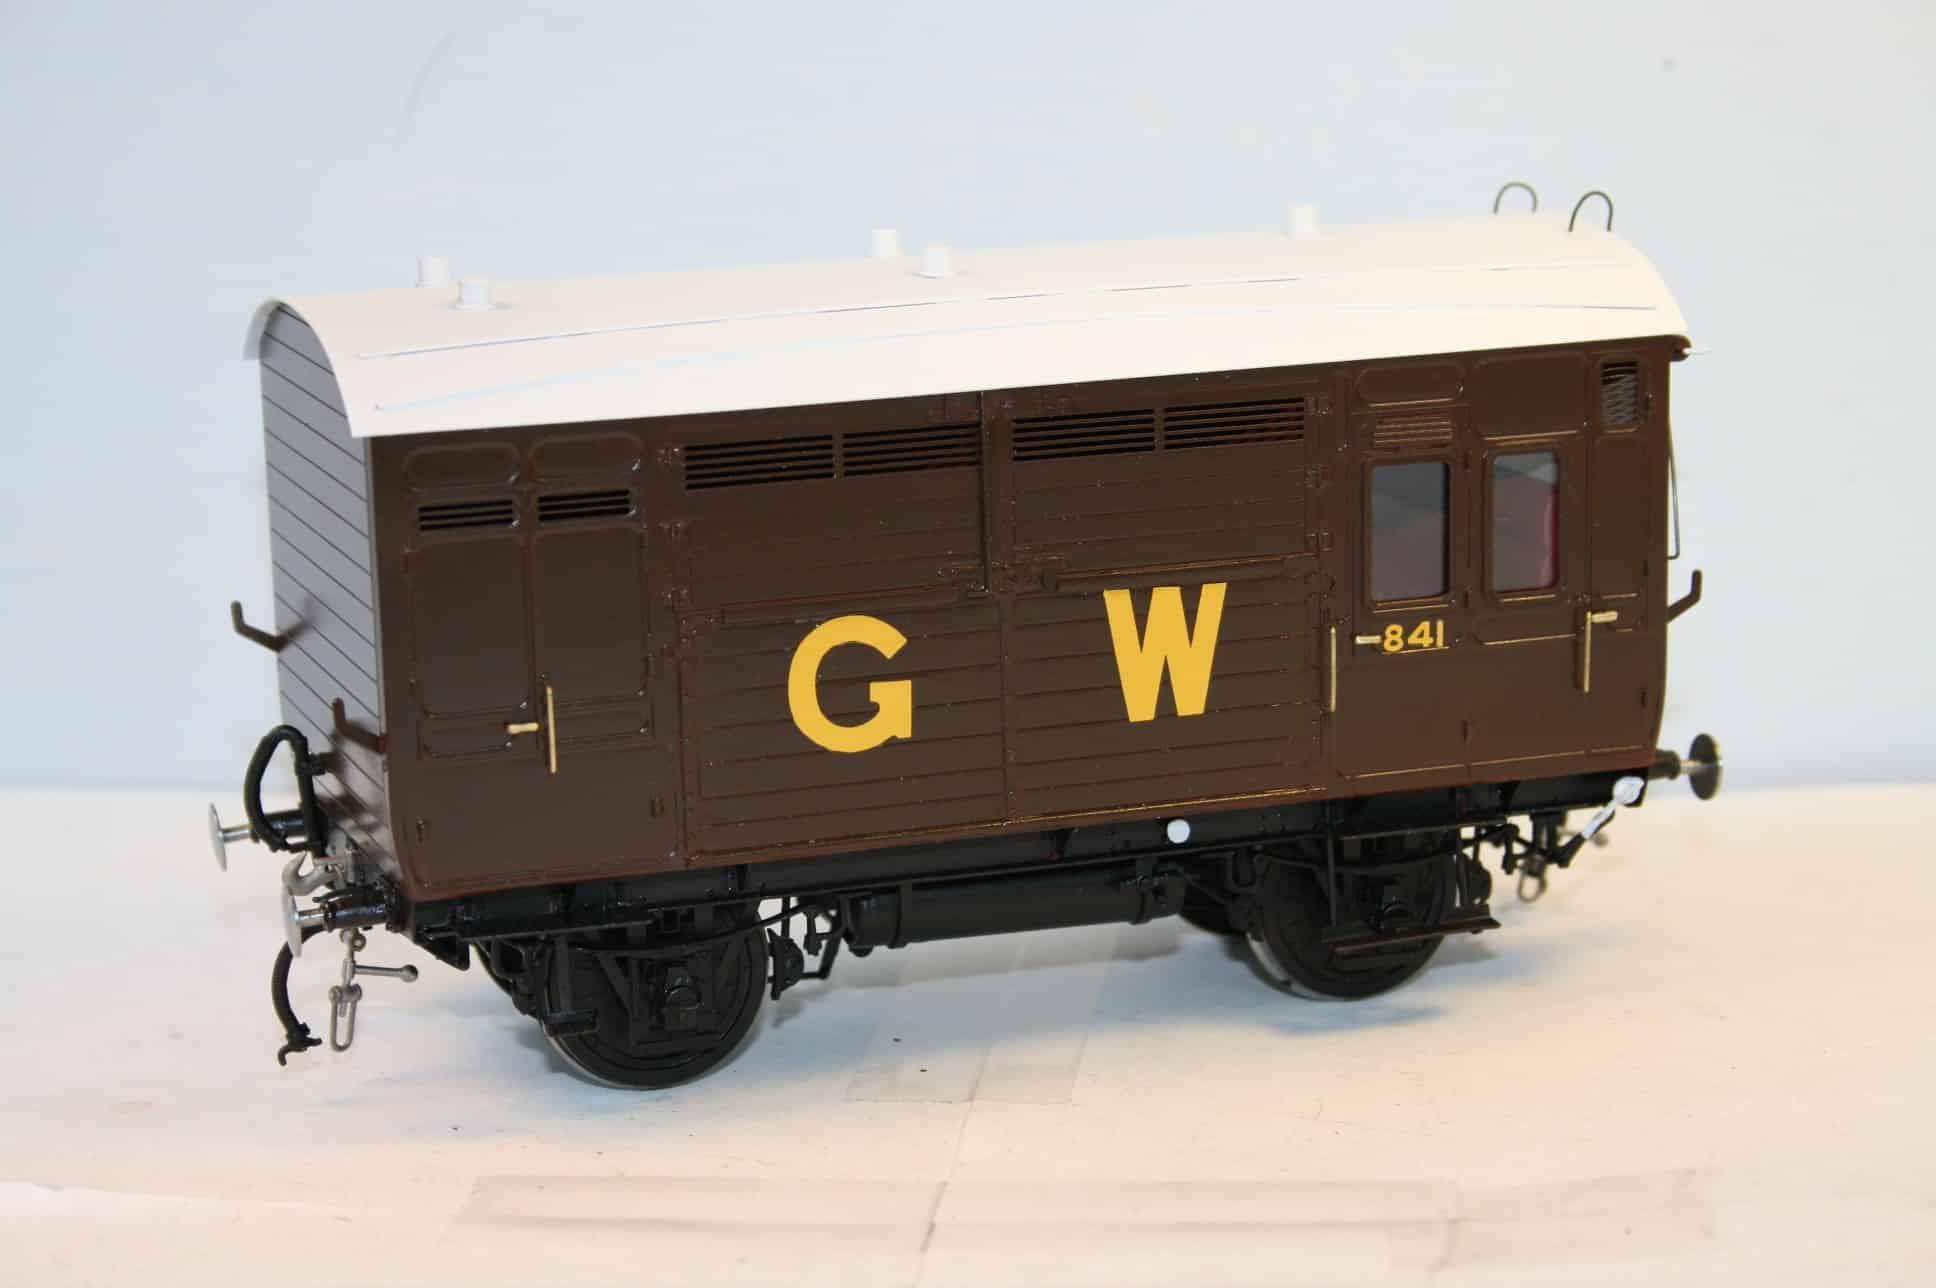 GWR Horsebox in circa 1912 condition